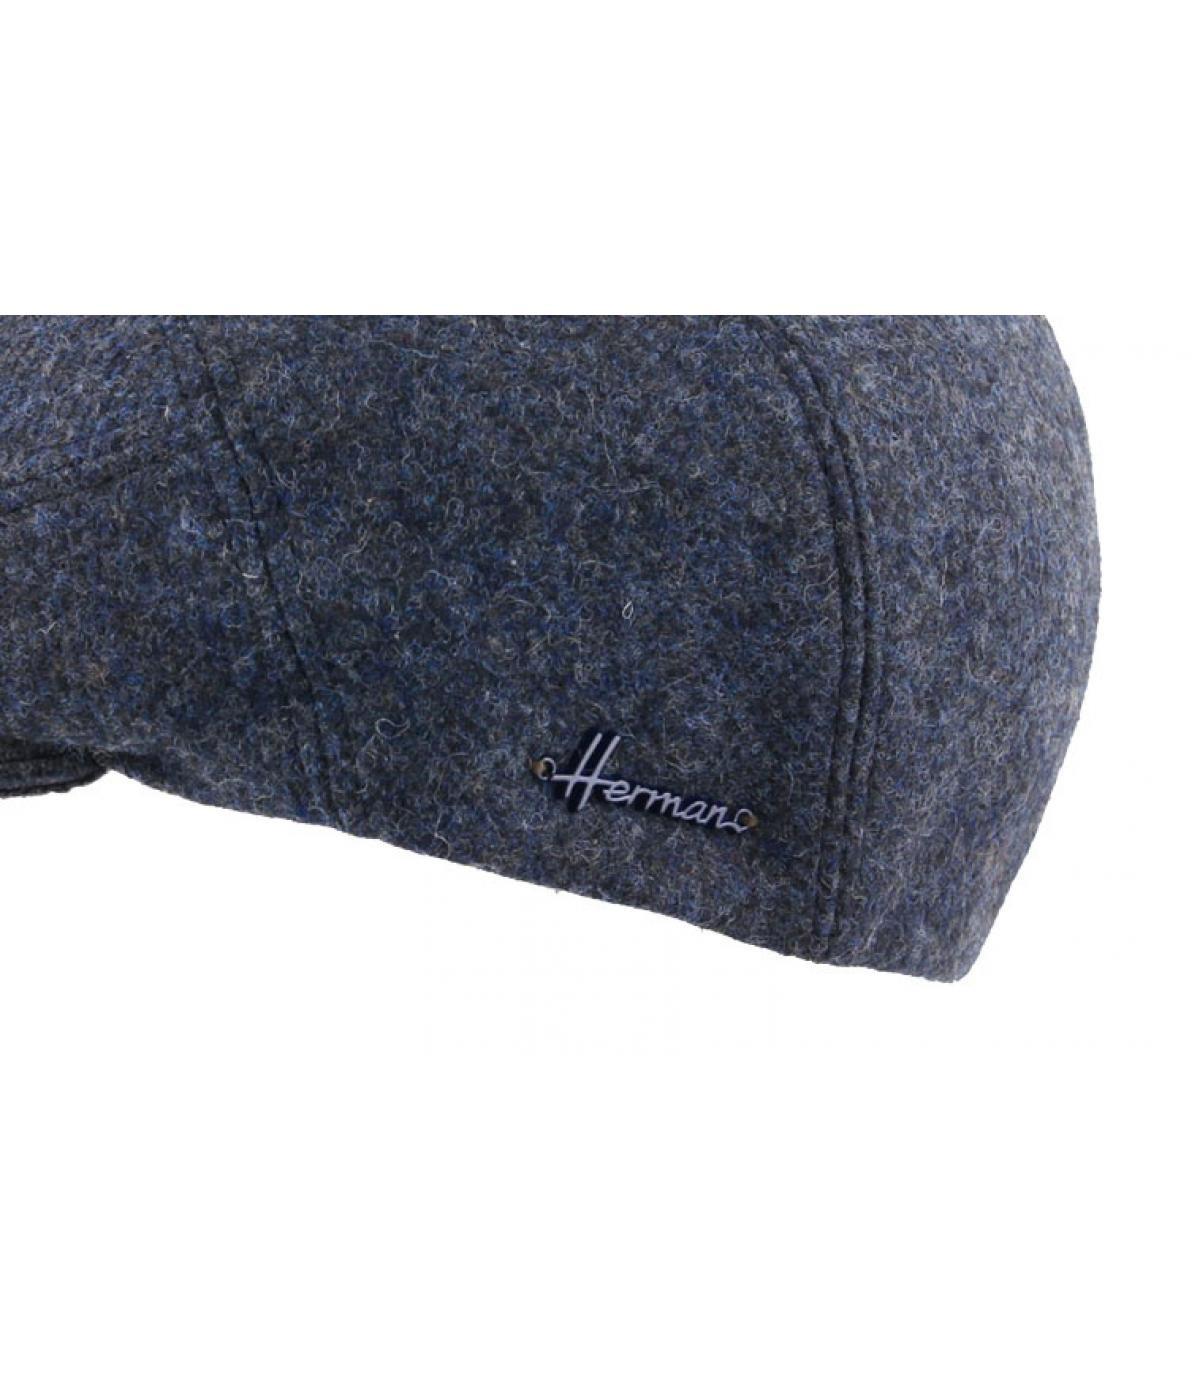 Dettagli Barents Wool Corduroy blue - image 3